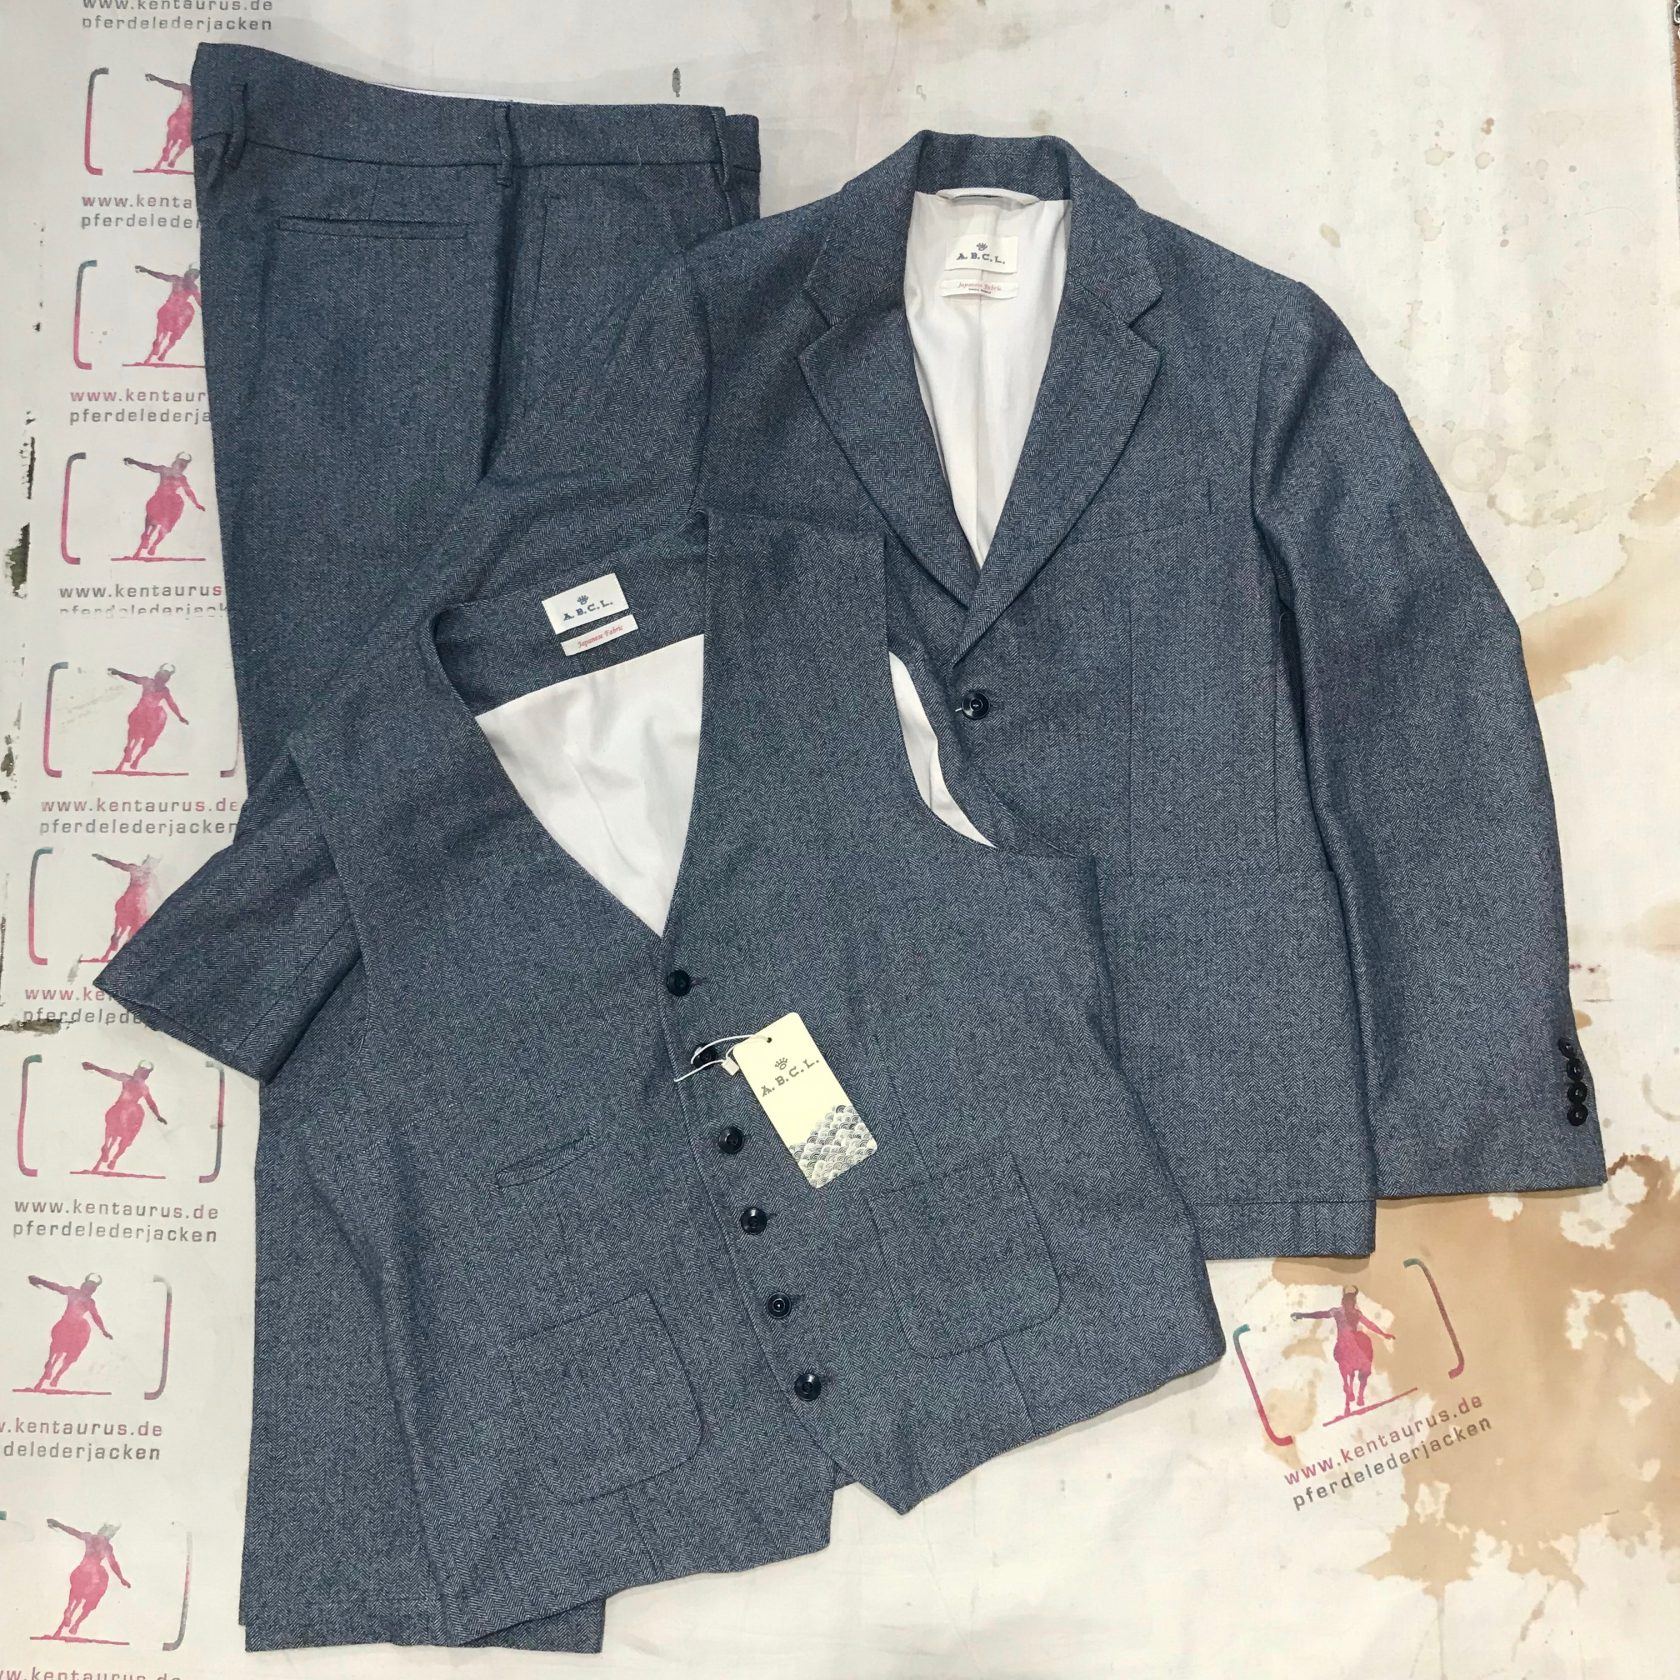 A.B.C.L. Japan 3 piece suit grey herringbone